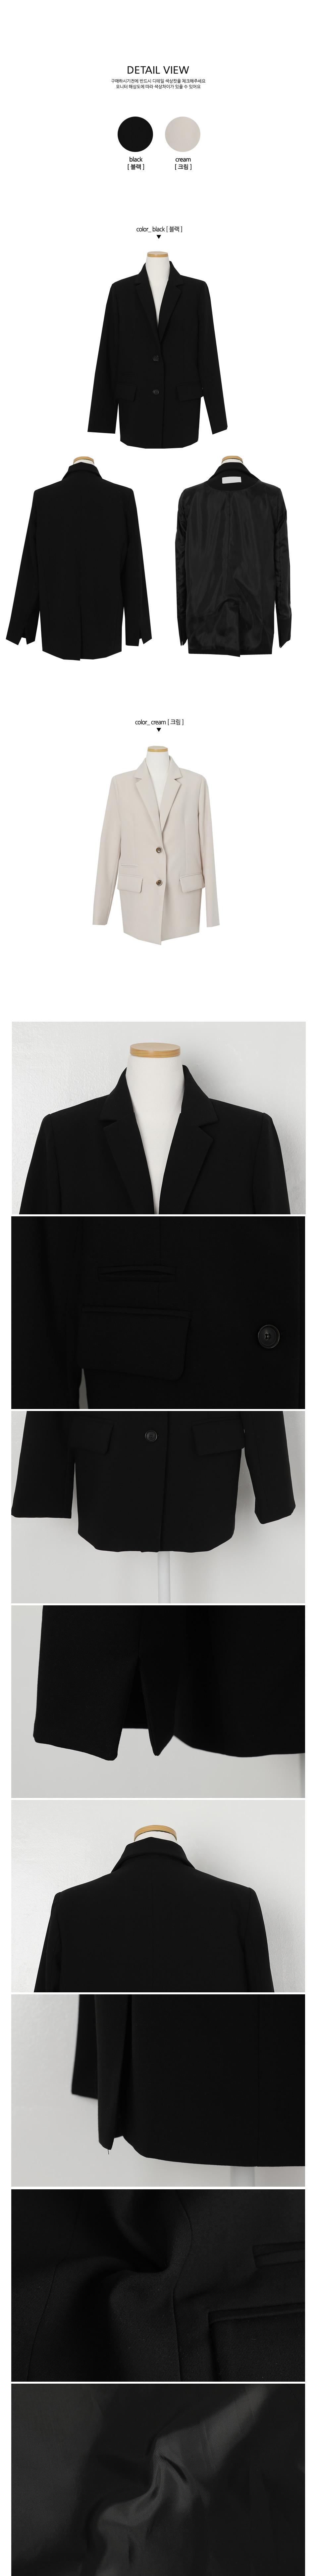 Miadier jacket